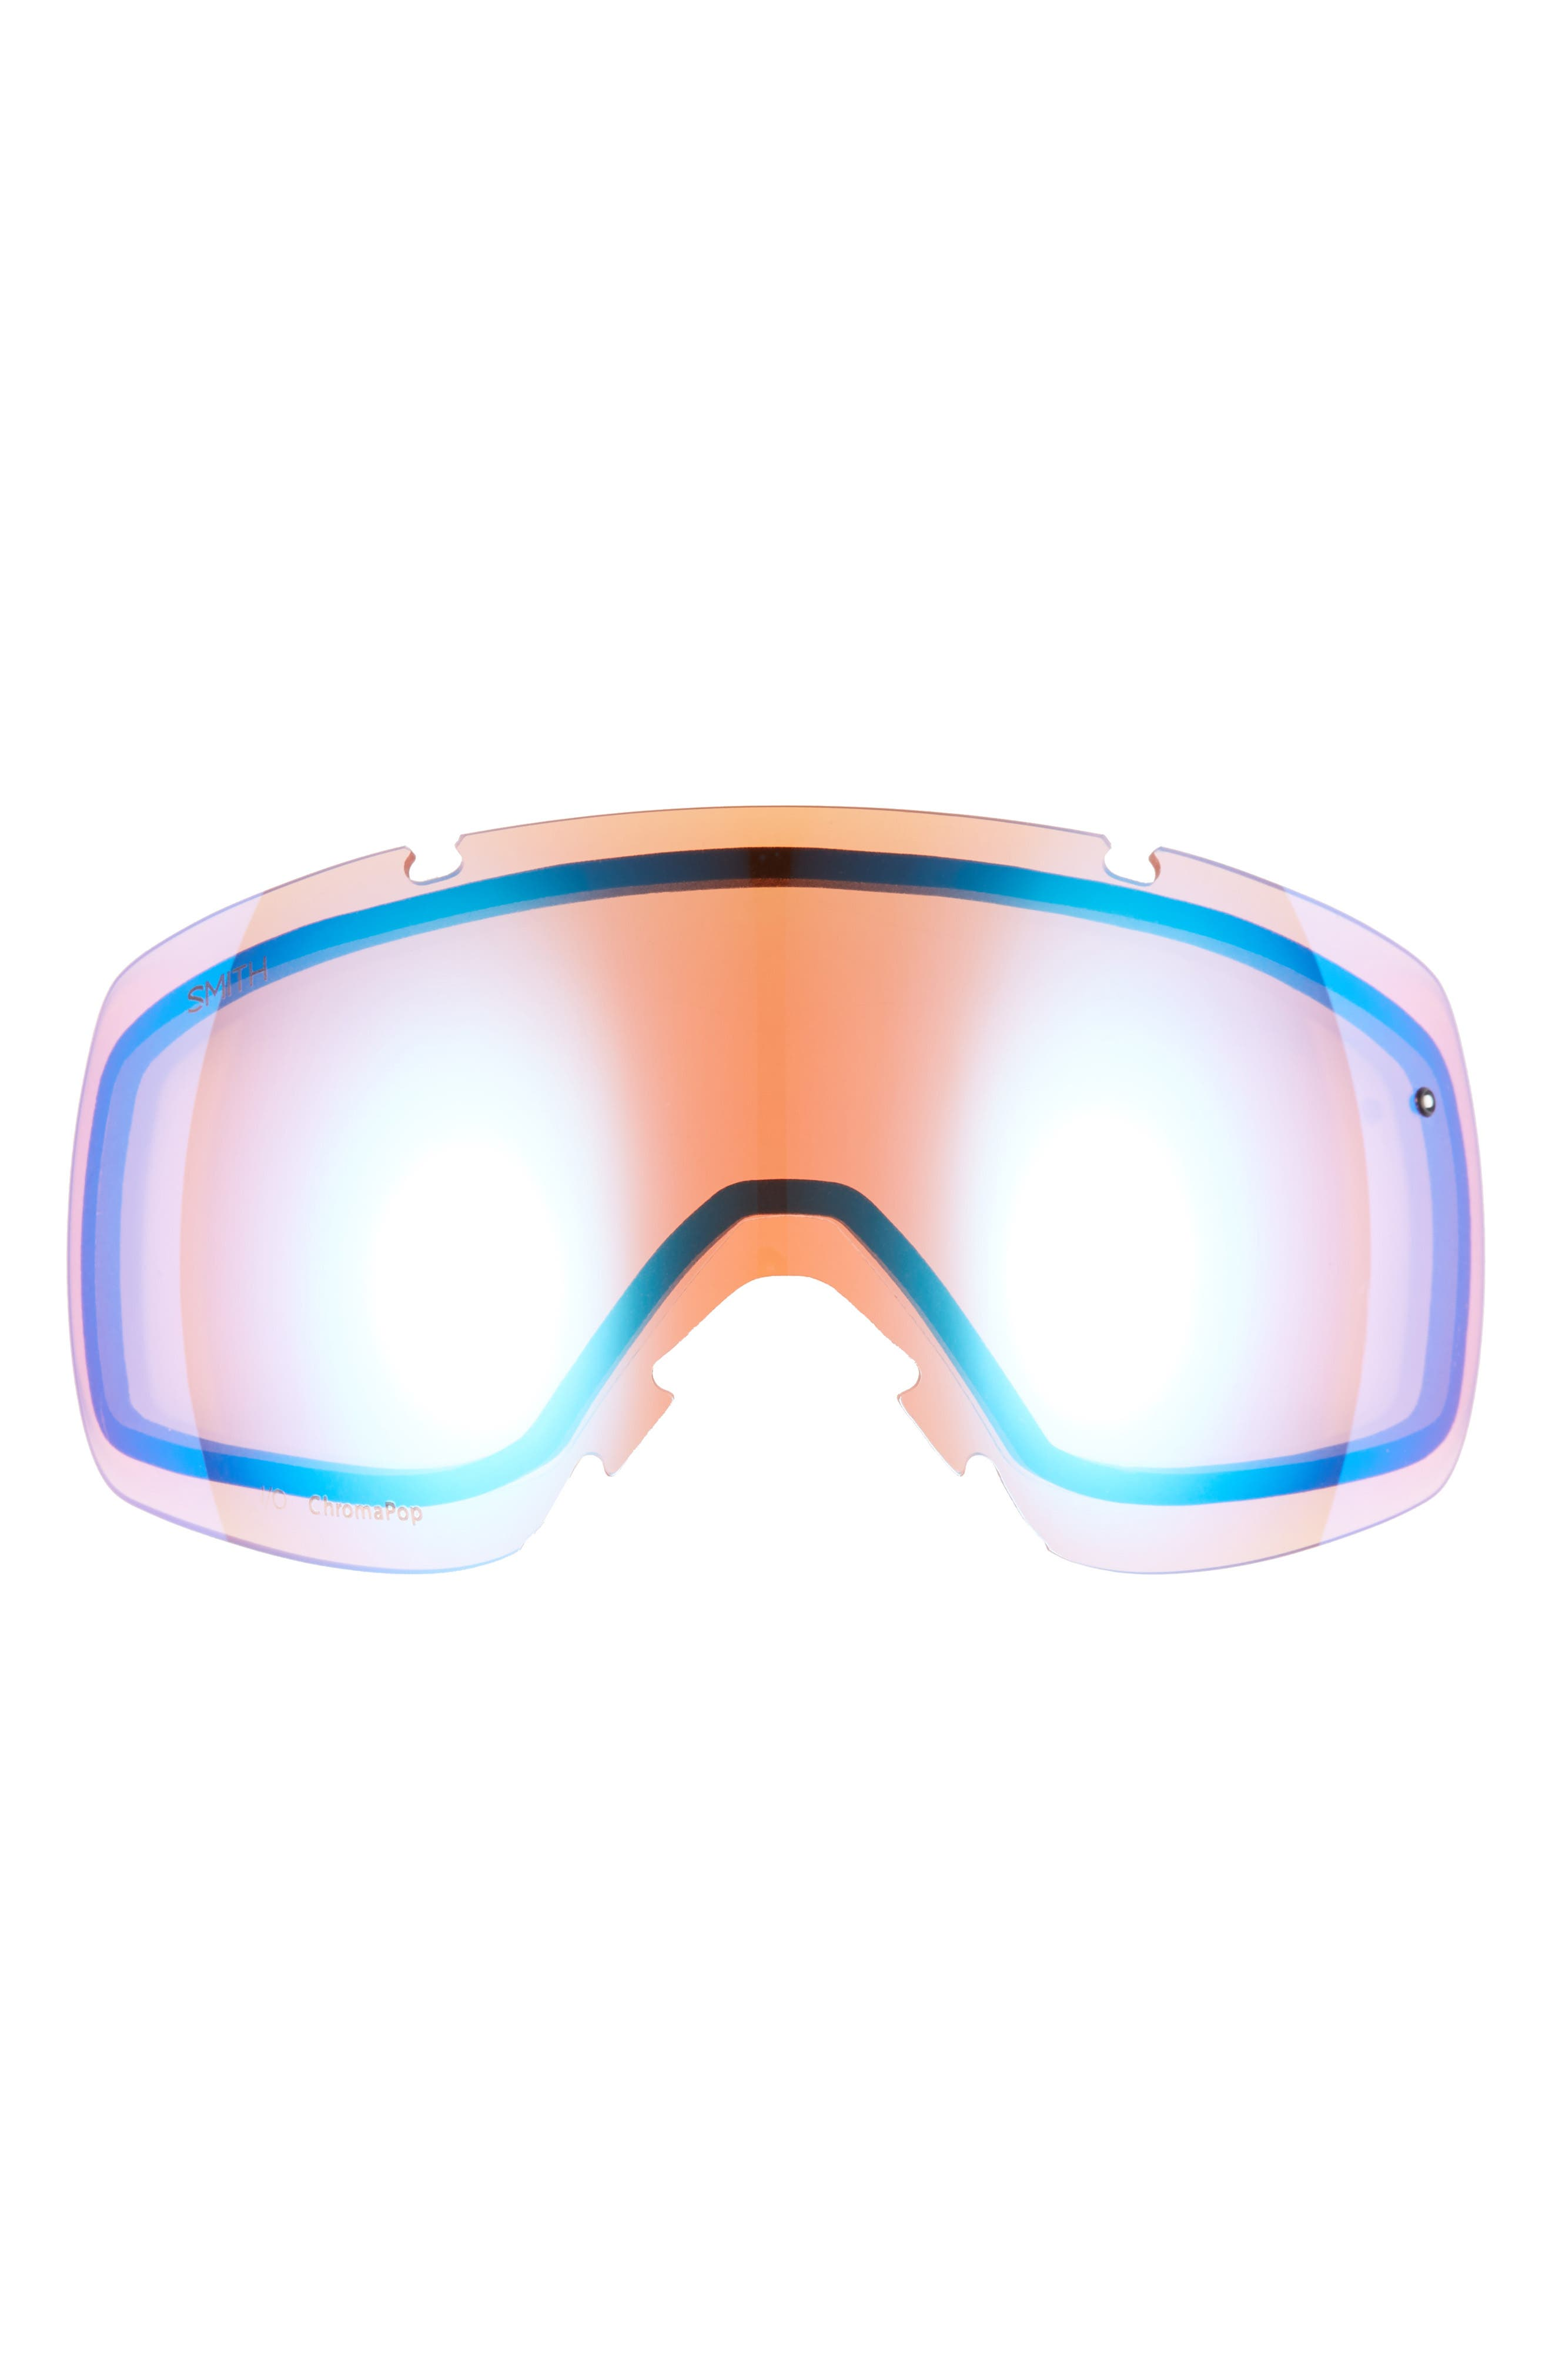 I/O 215mm ChromaPop Snow Goggles,                             Alternate thumbnail 3, color,                             OXIDE MOJAVE